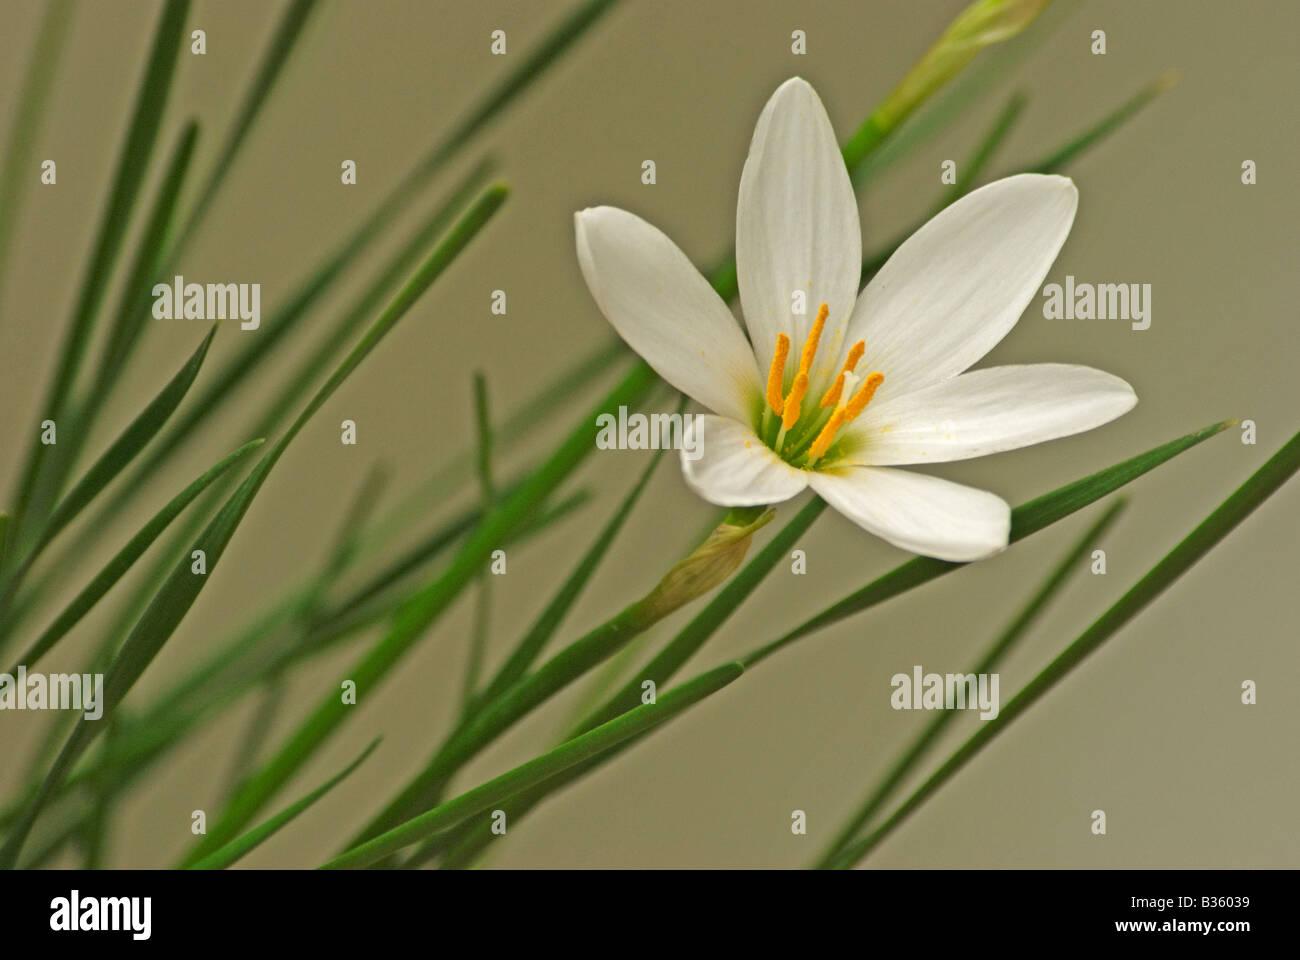 White Rain Lily Flower Stock Photo 19186141 Alamy